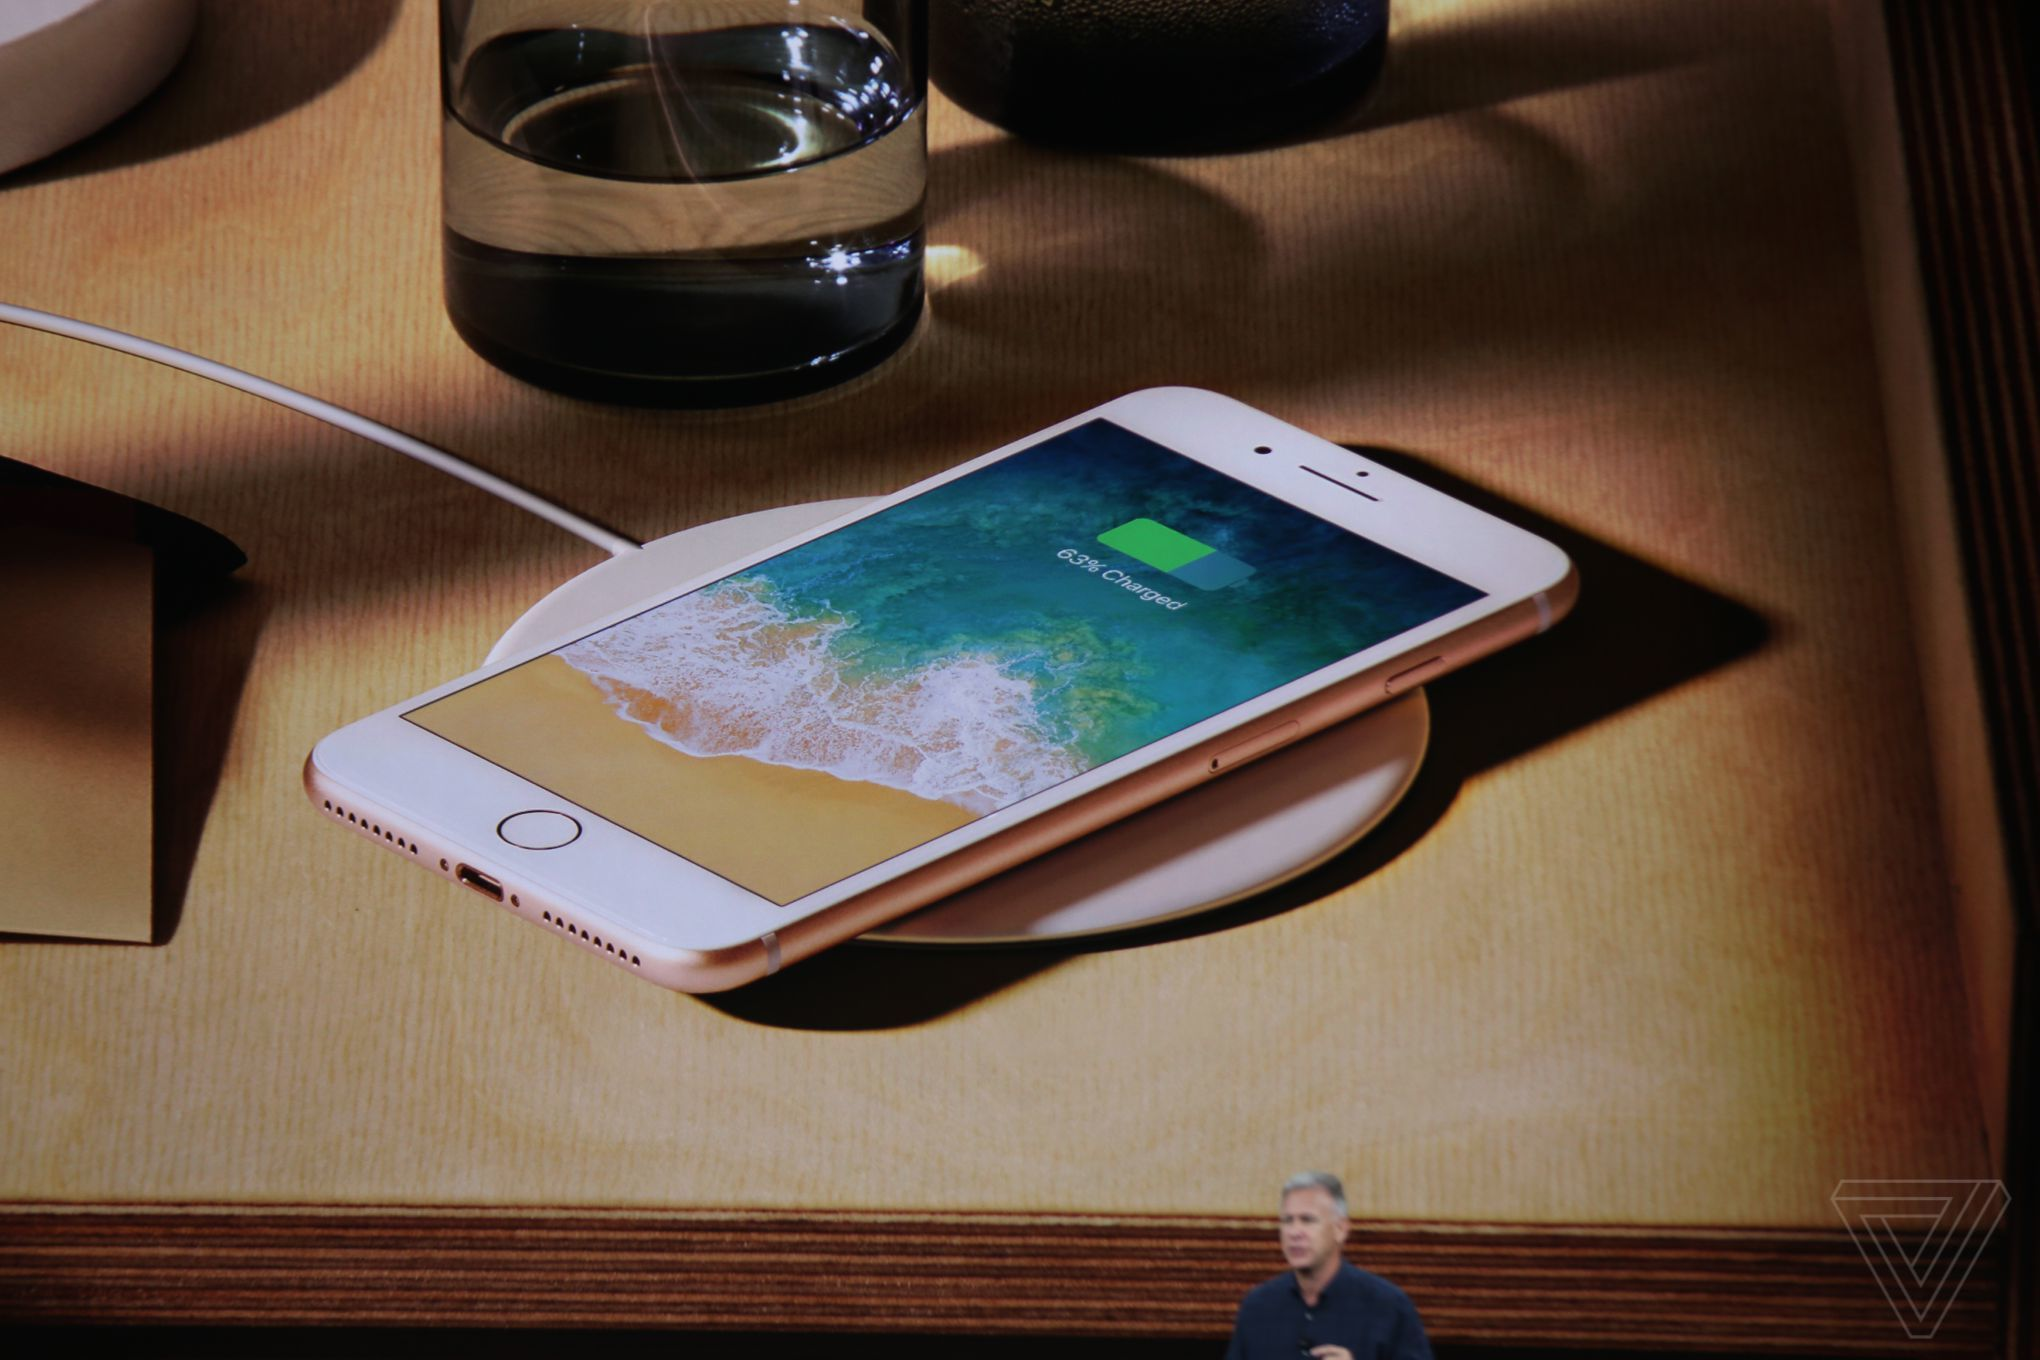 iPhone8 Plus快充多久能满?实测还是失望